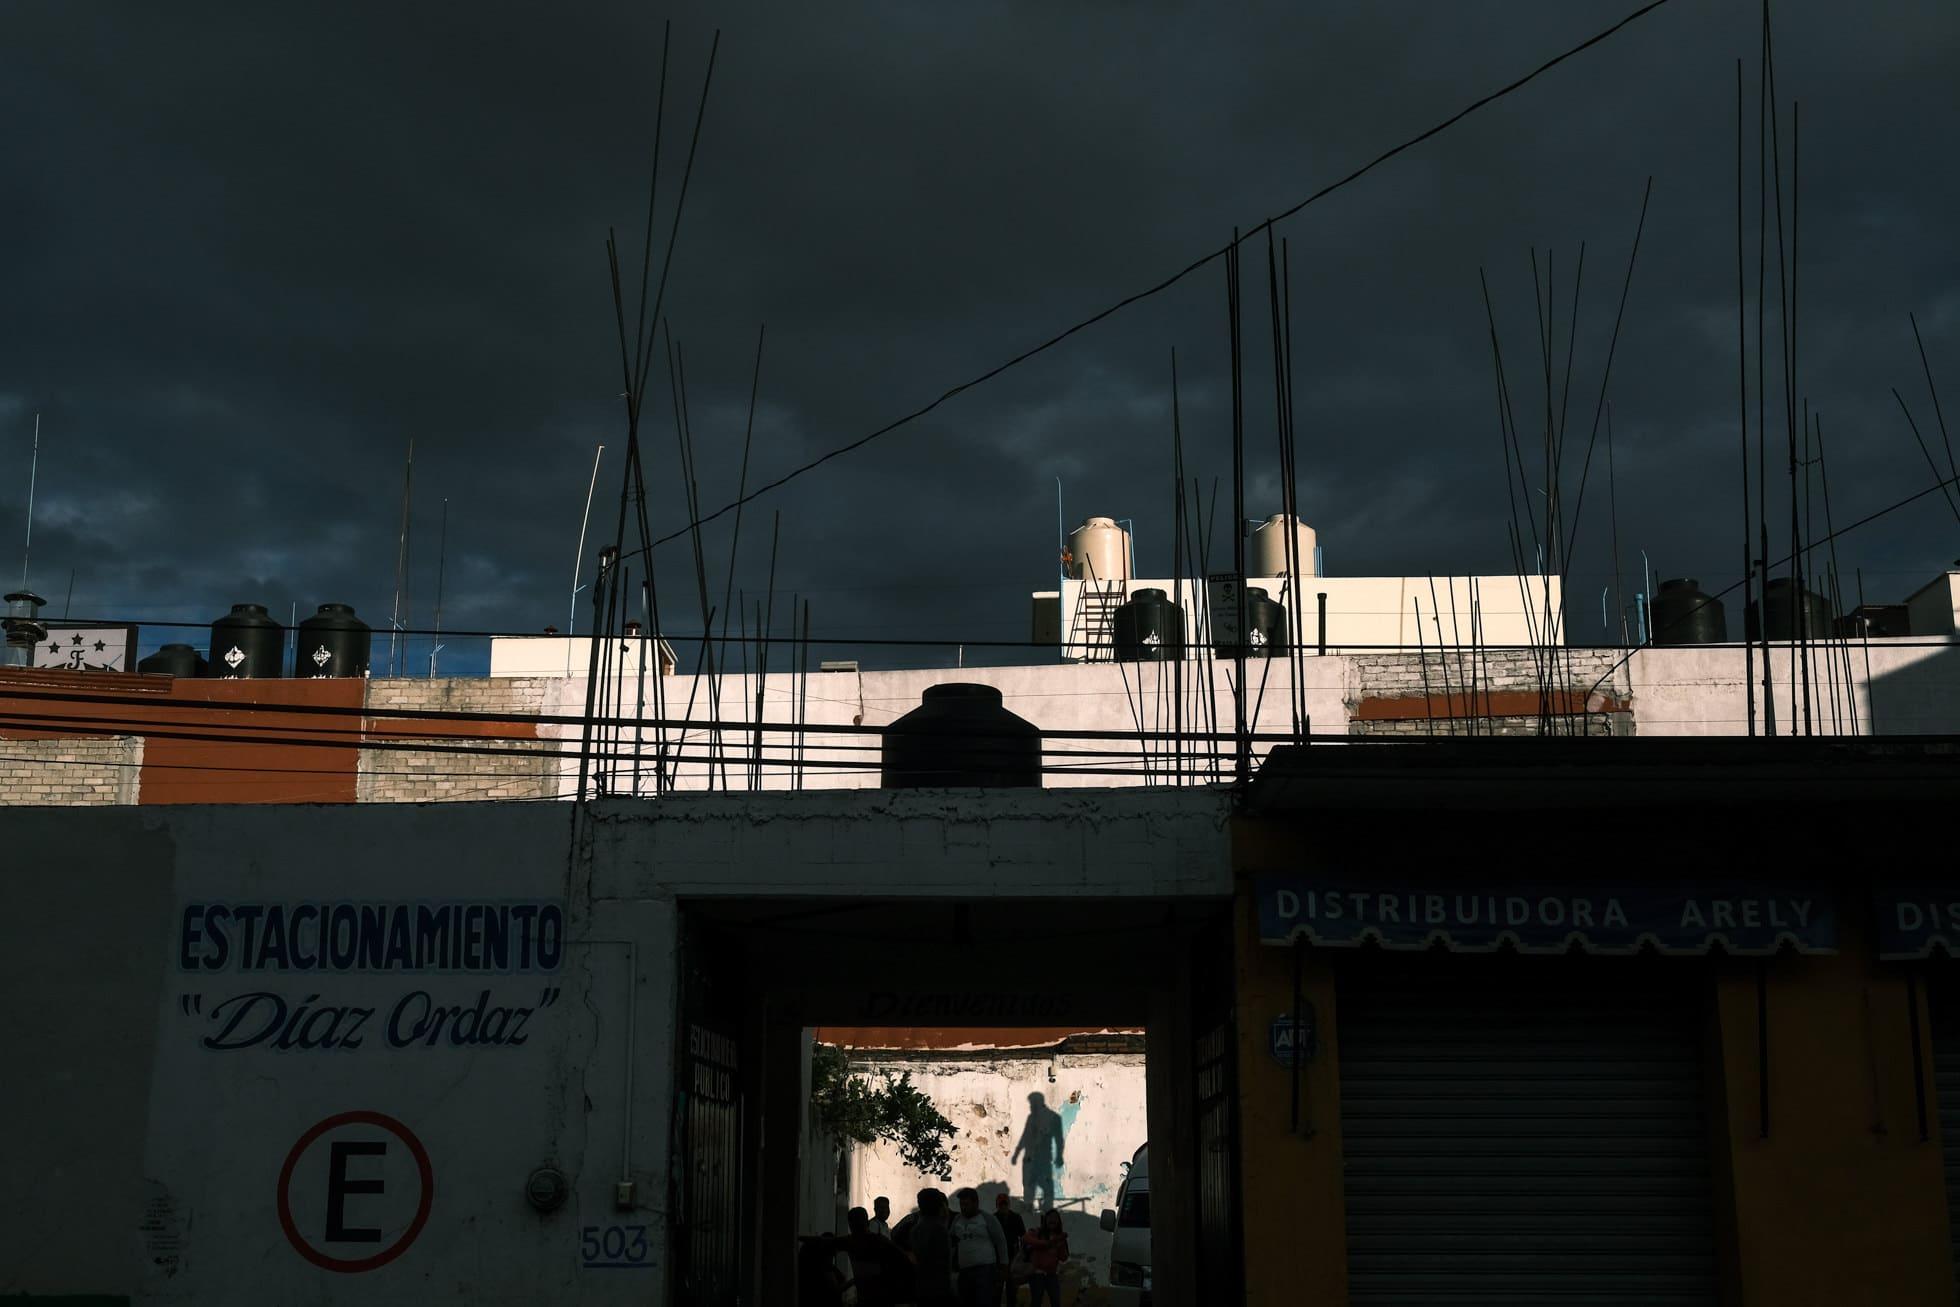 fujifilm-x-pro3-mexico-street-photography-27